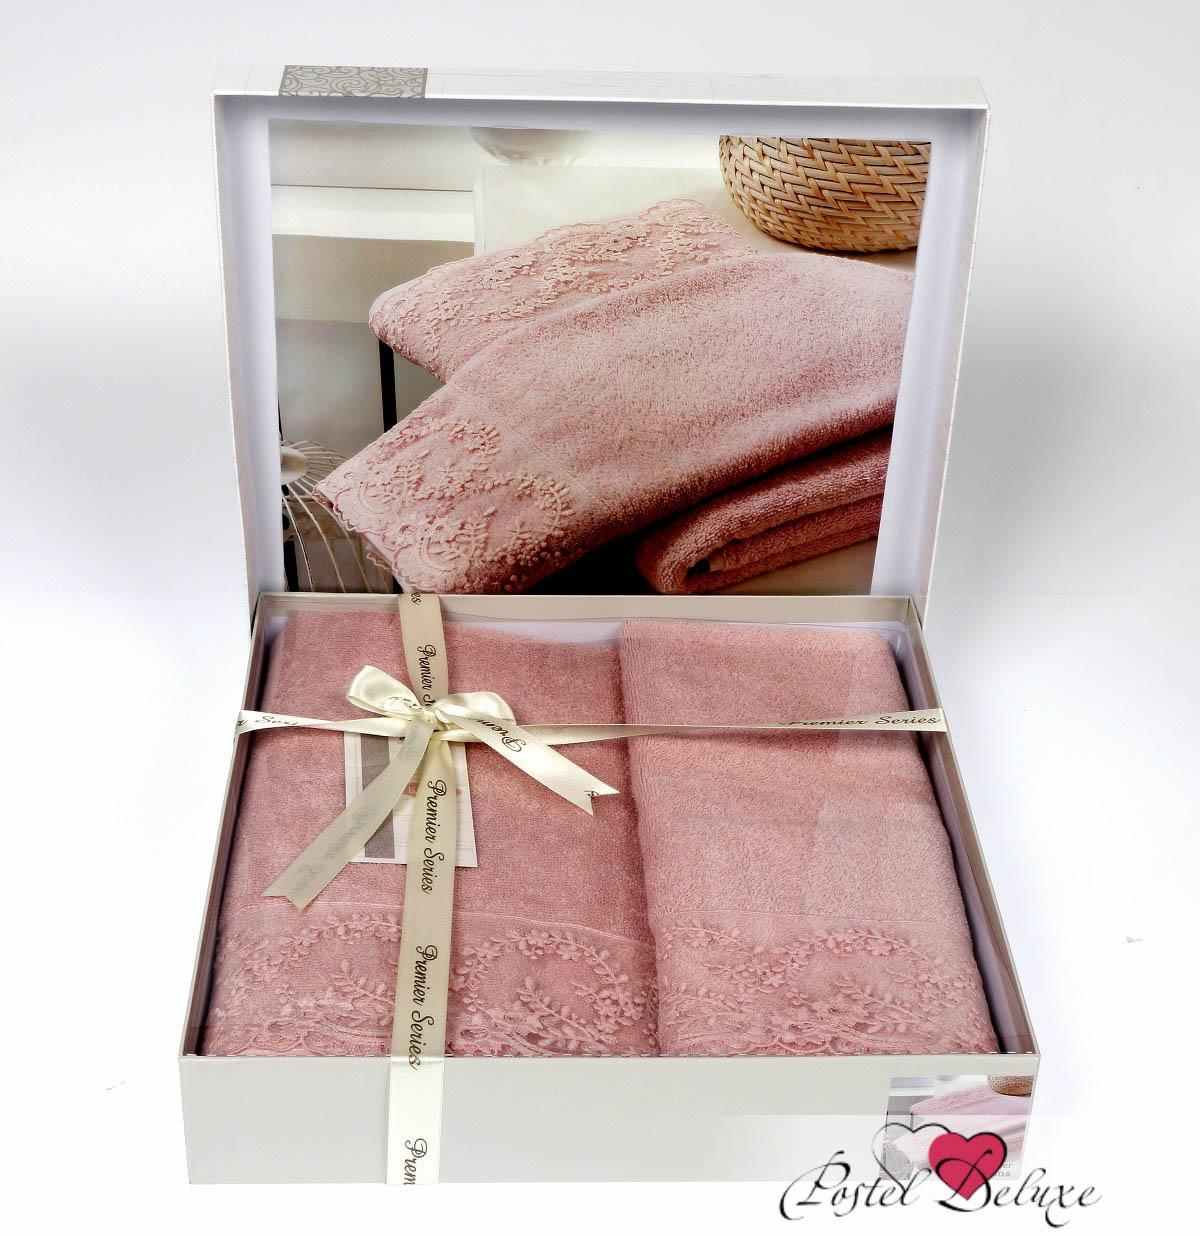 Полотенца Karna Полотенце Elinda Цвет: Пудра (Набор) наматрасник karna с пропиткой 120x200 см